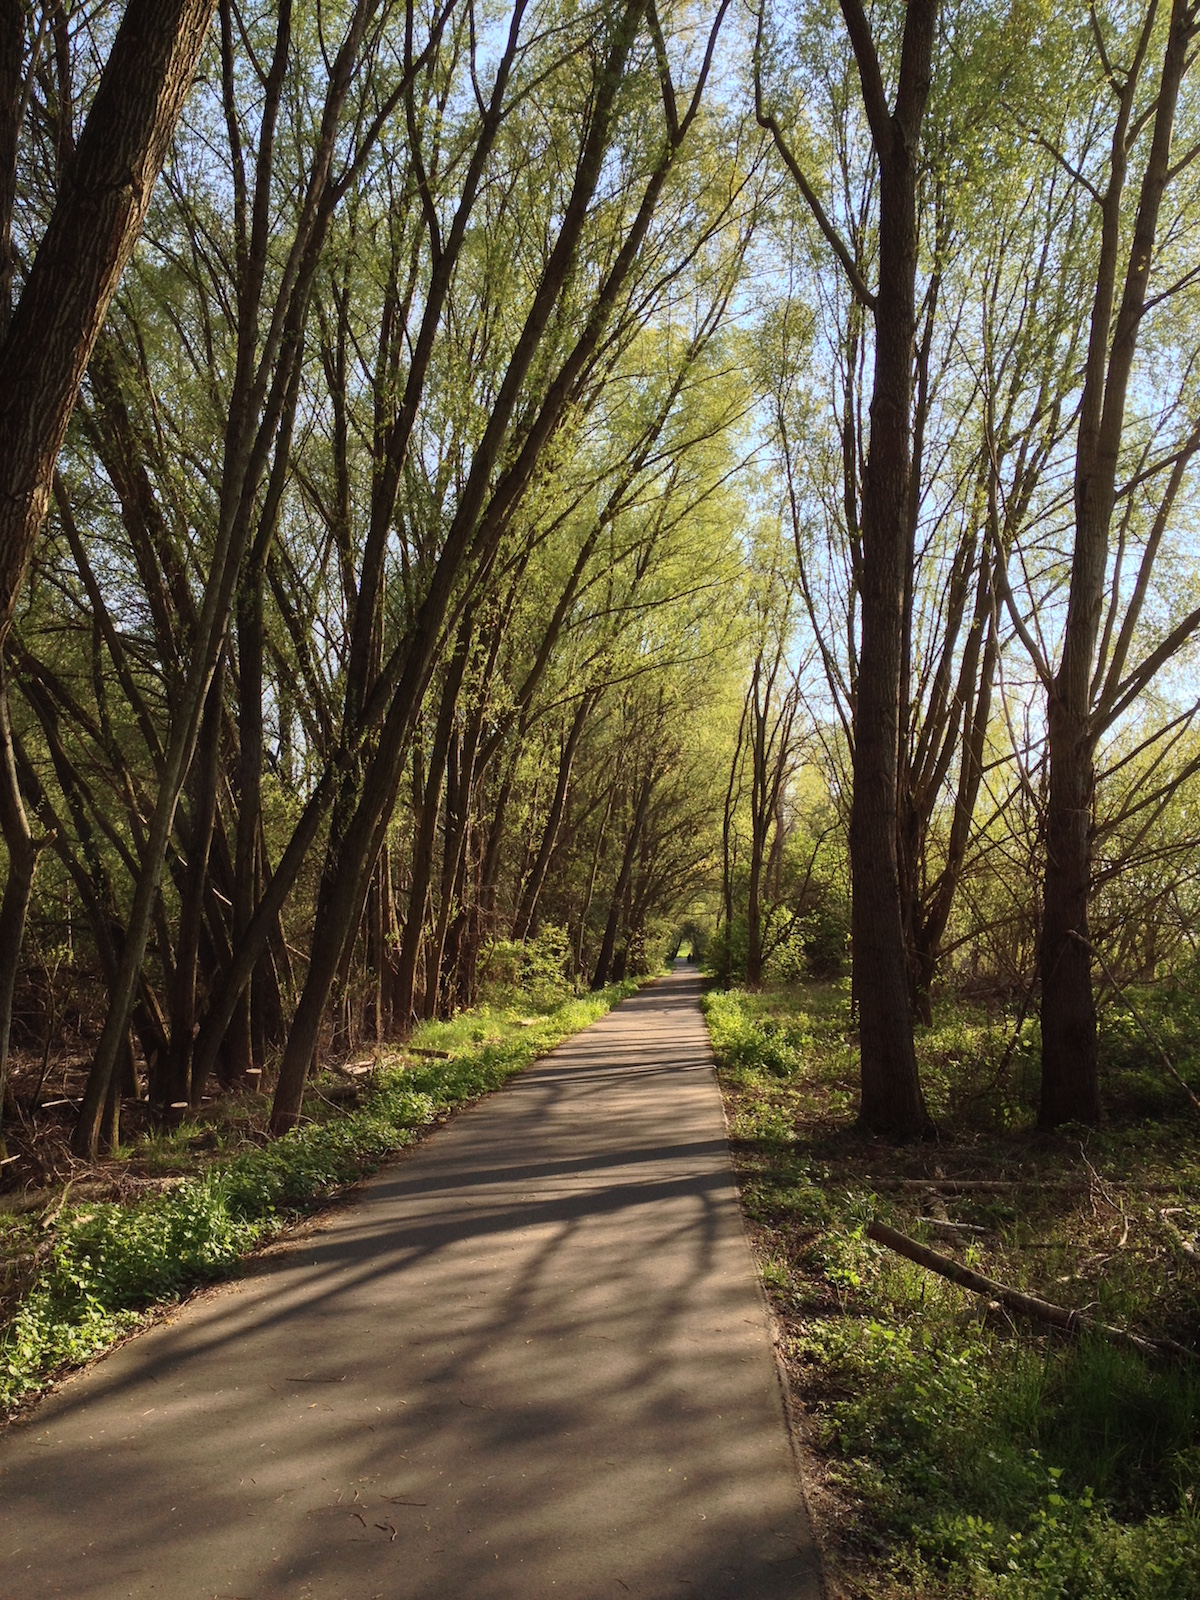 Langer, leerer Radweg im Wald